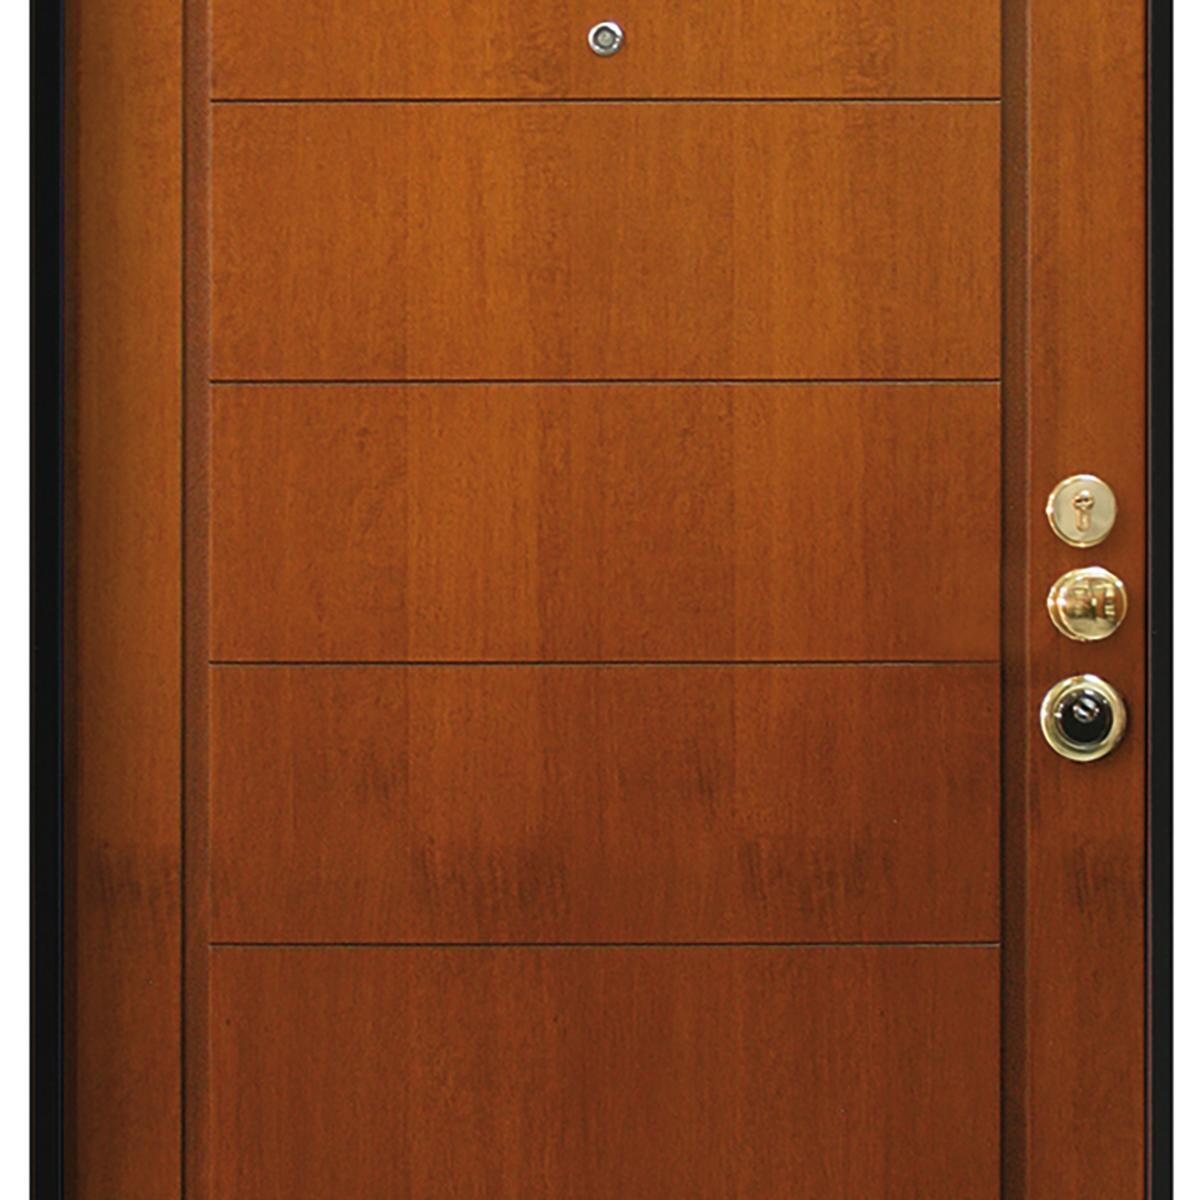 Porta blindata Best noce L 80 x H 210 cm sinistra - 2